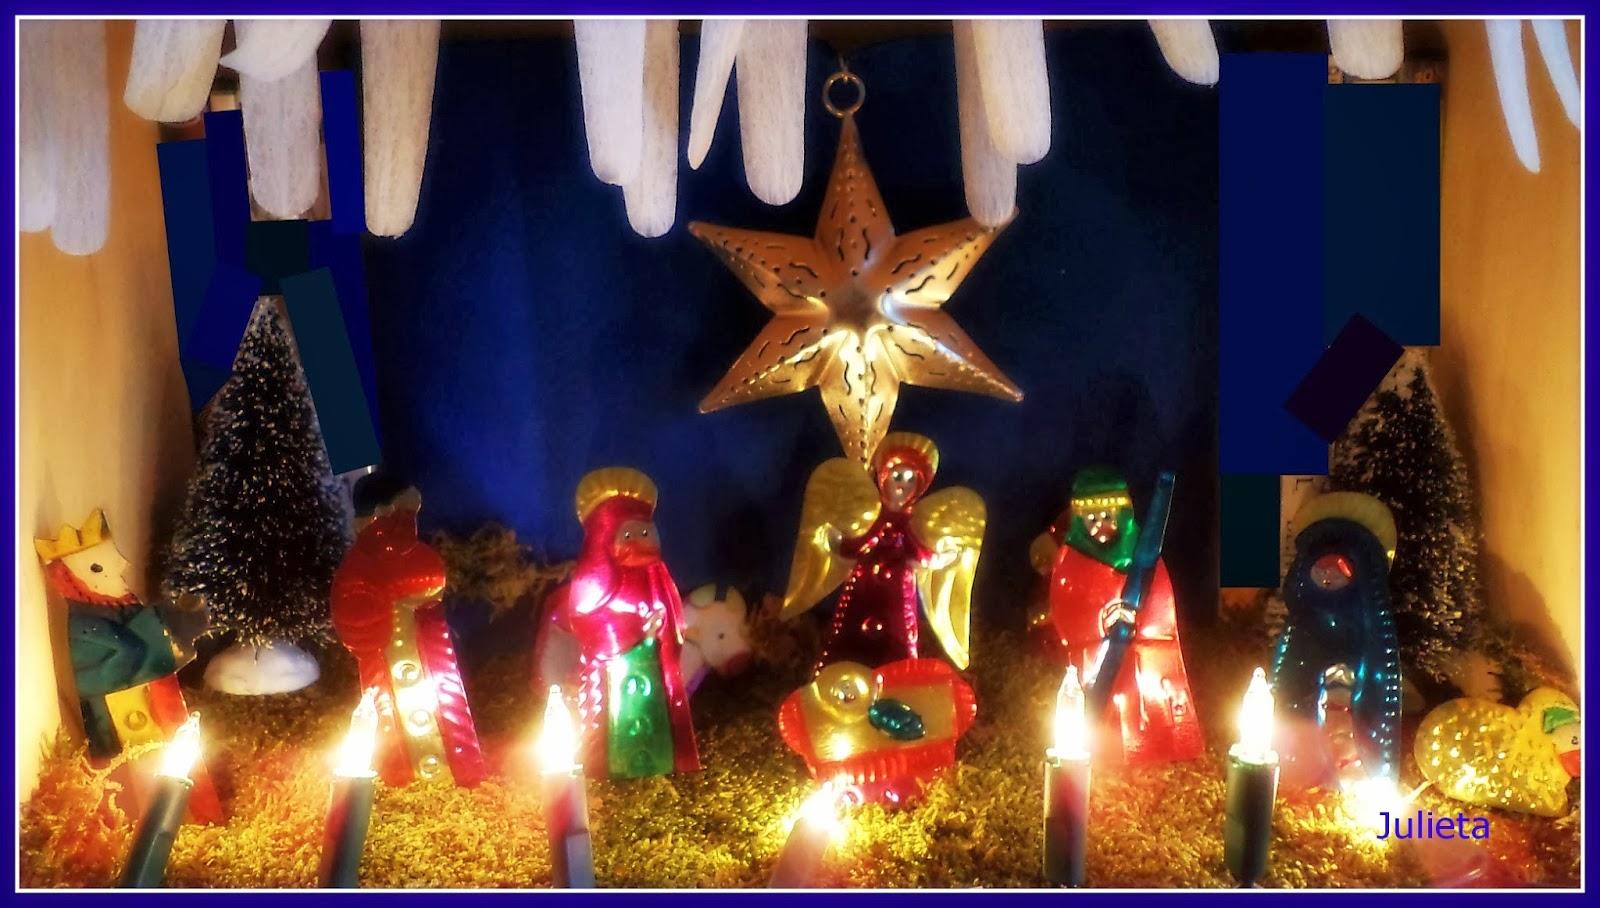 La mu eca juanita felices fiestas y fant stico 2014 for Decoracion navidena artesanal